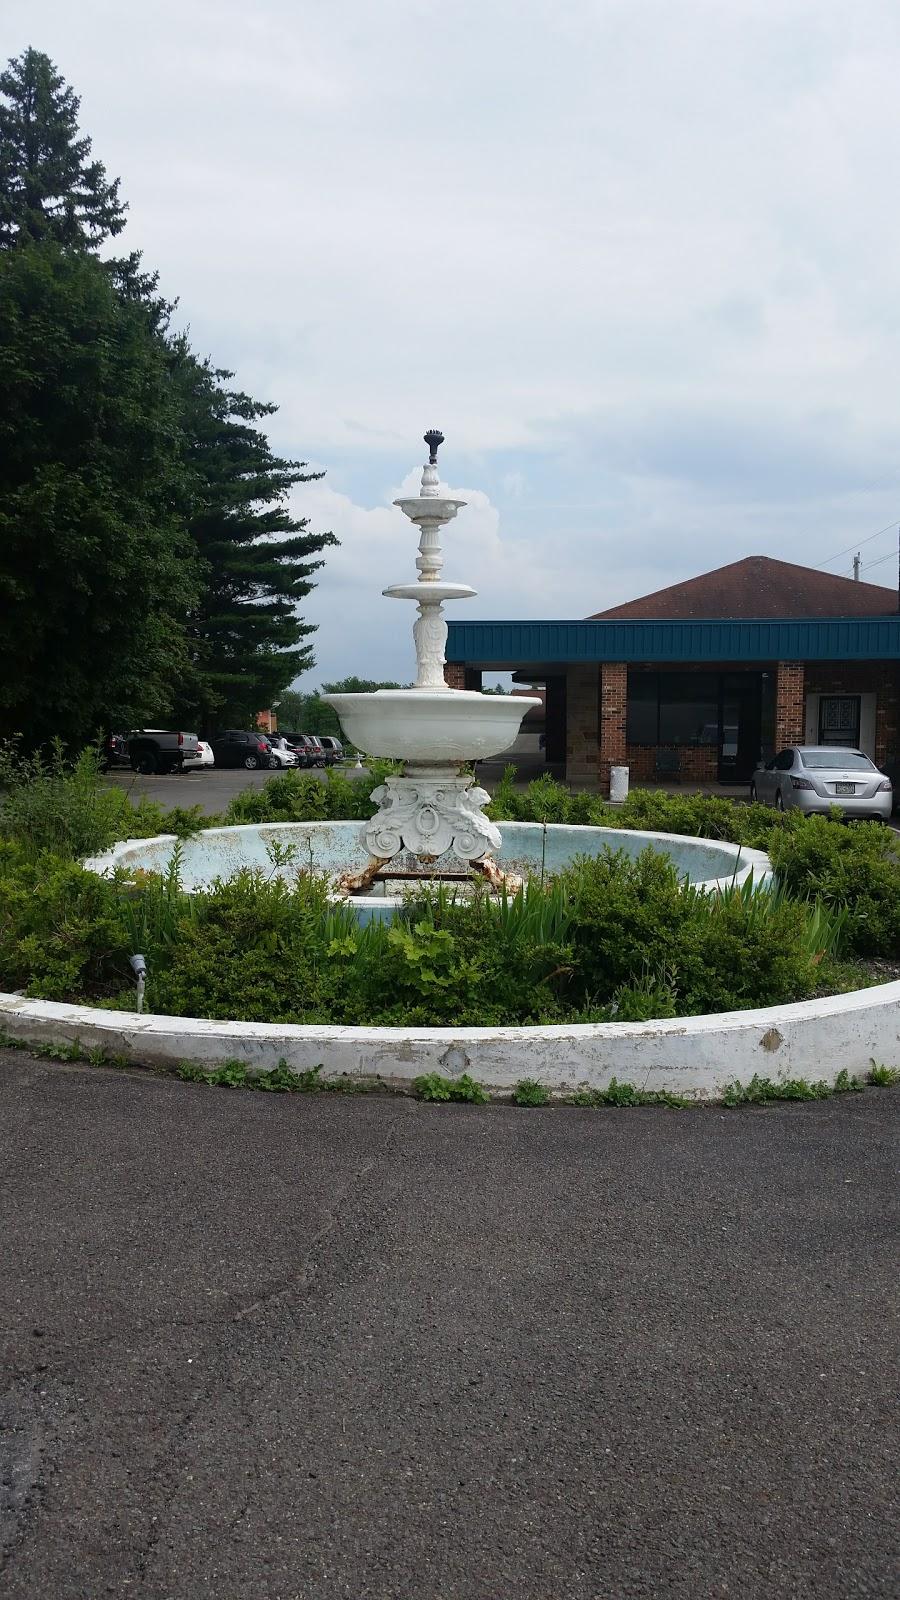 Mount Pocono Motel - lodging  | Photo 1 of 10 | Address: 112 Cleveland Ave, Mt Pocono, PA 18344, USA | Phone: (570) 839-0700